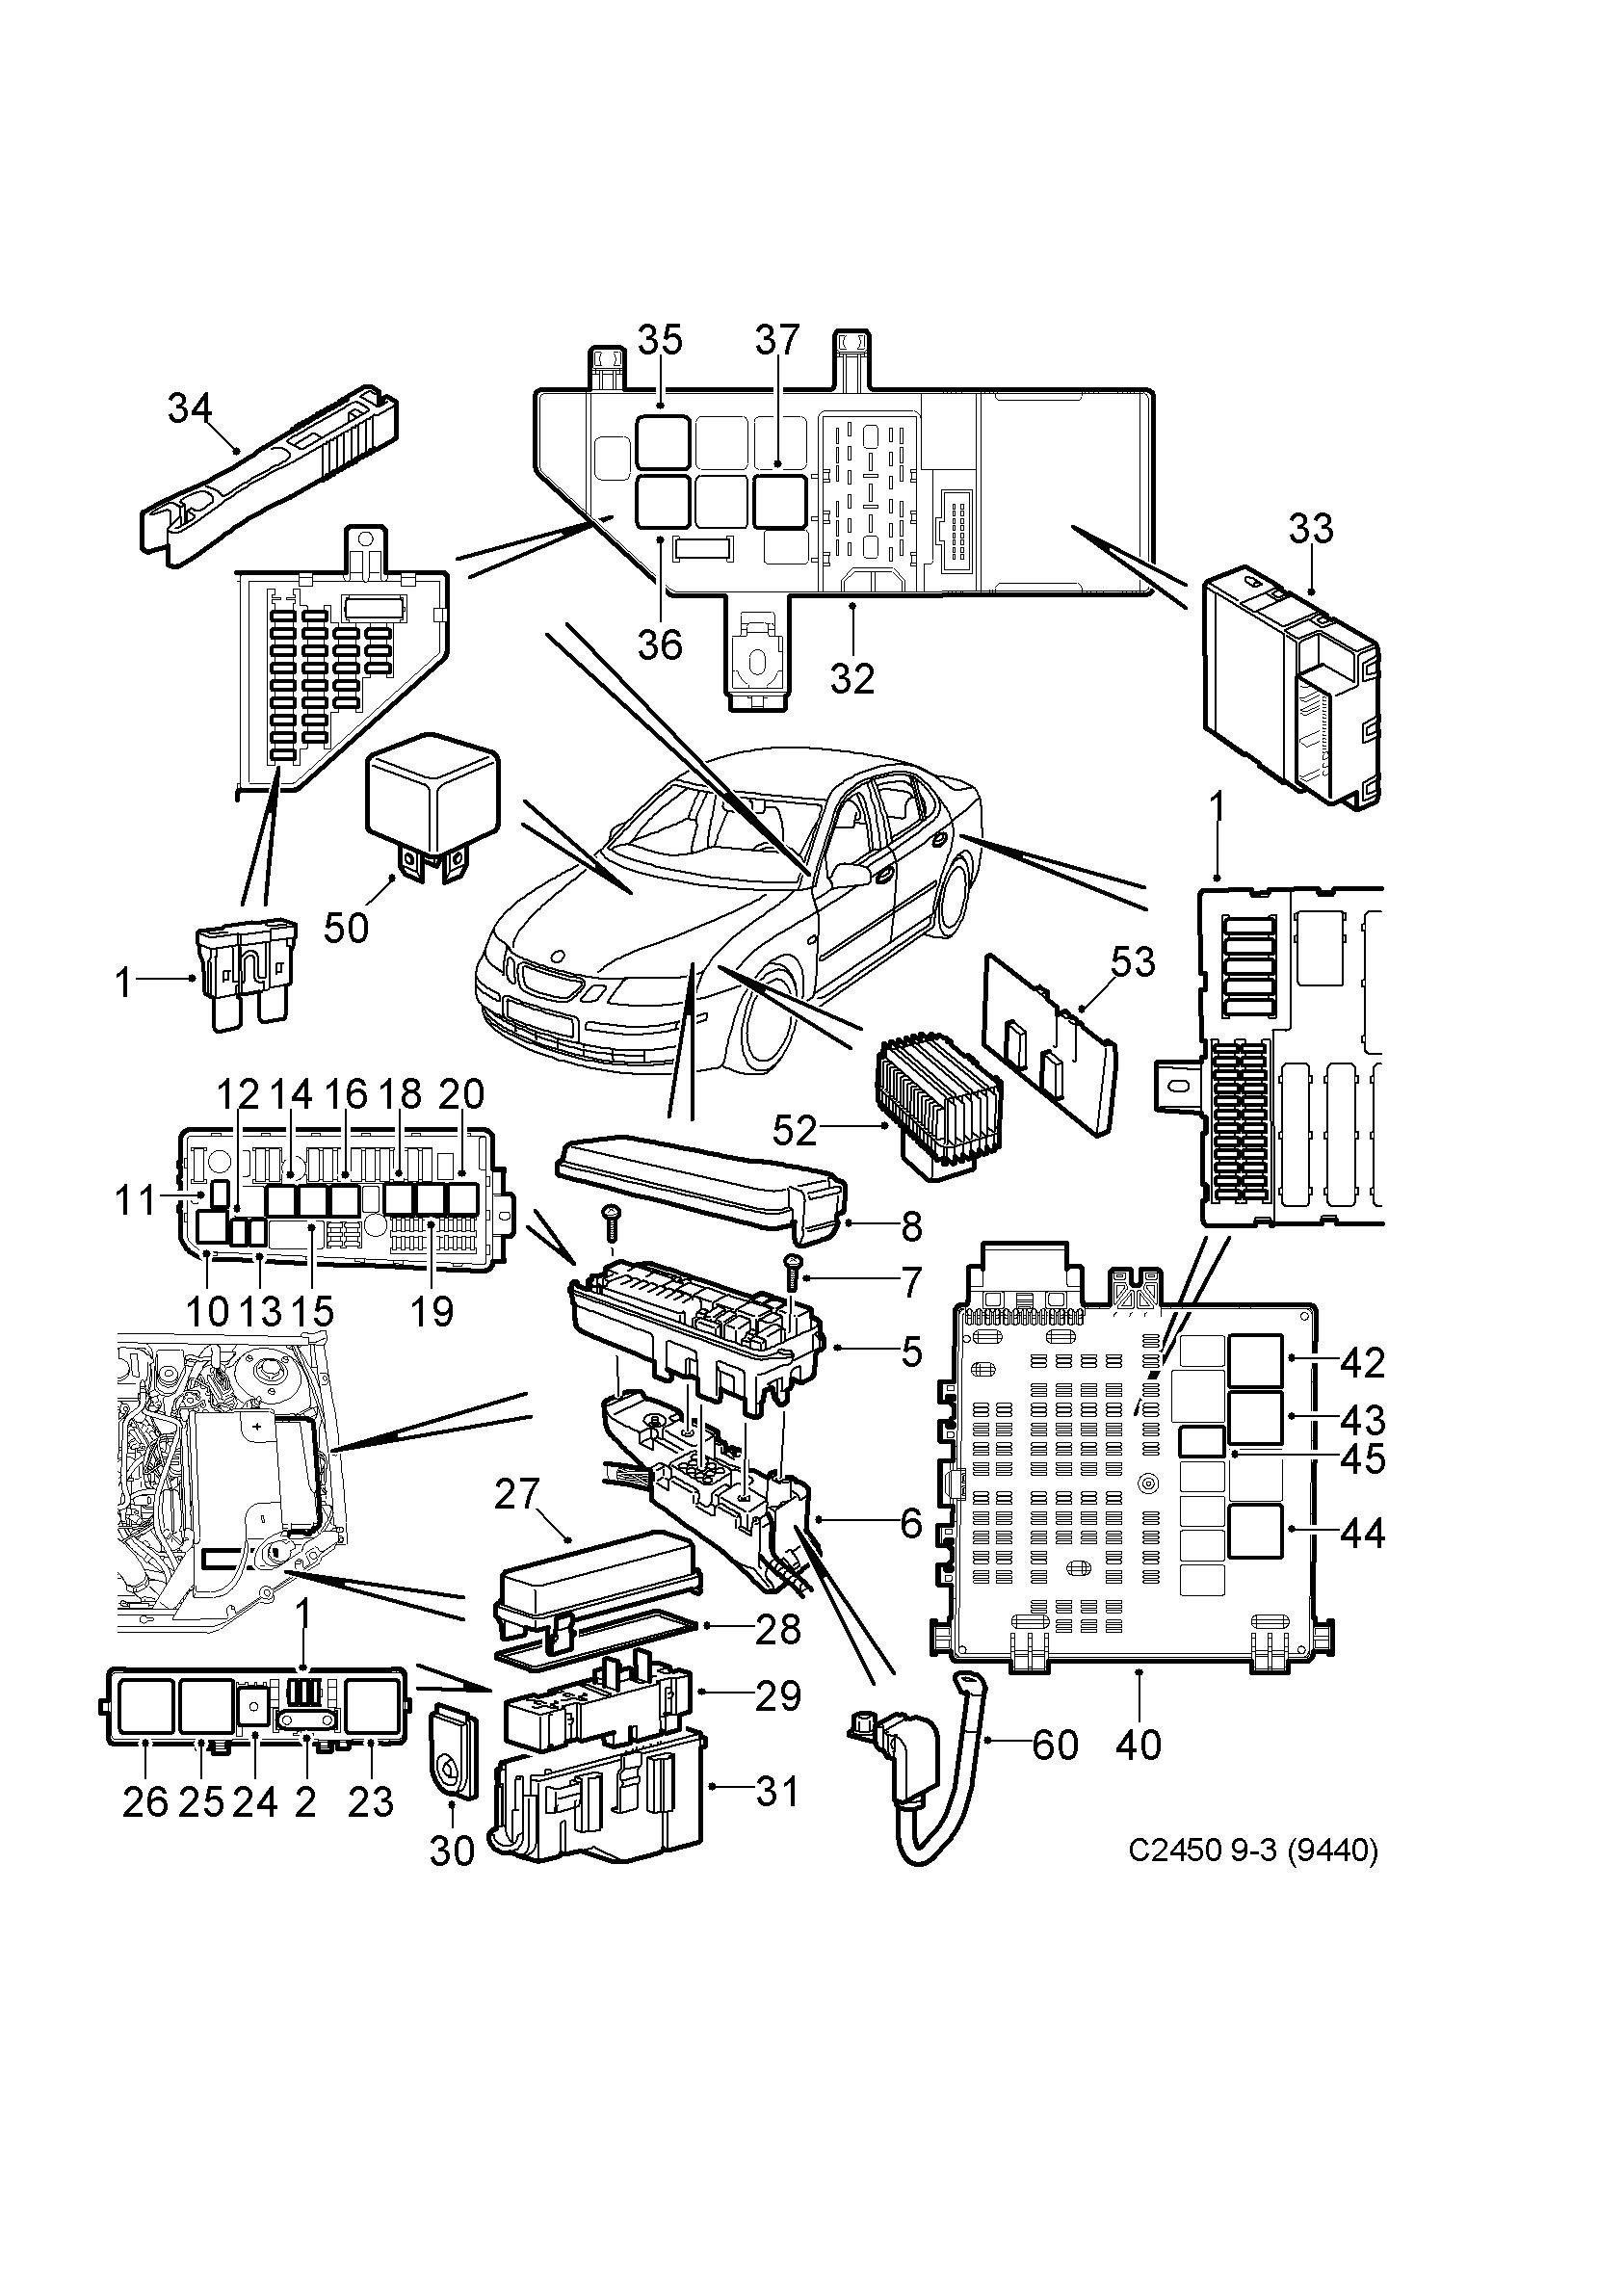 hight resolution of saab 9 3 9440 spare parts catalog epc